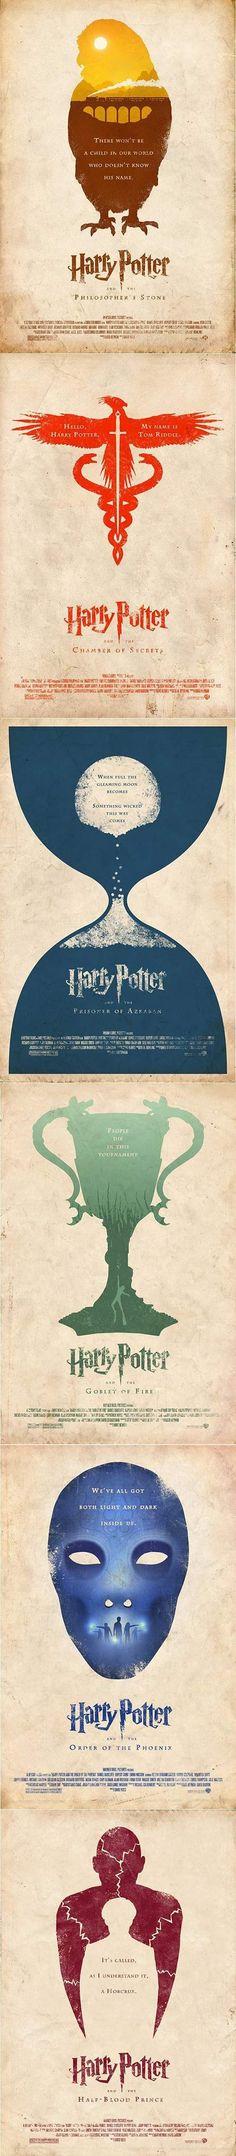 Harry Potter Minimalist Posters